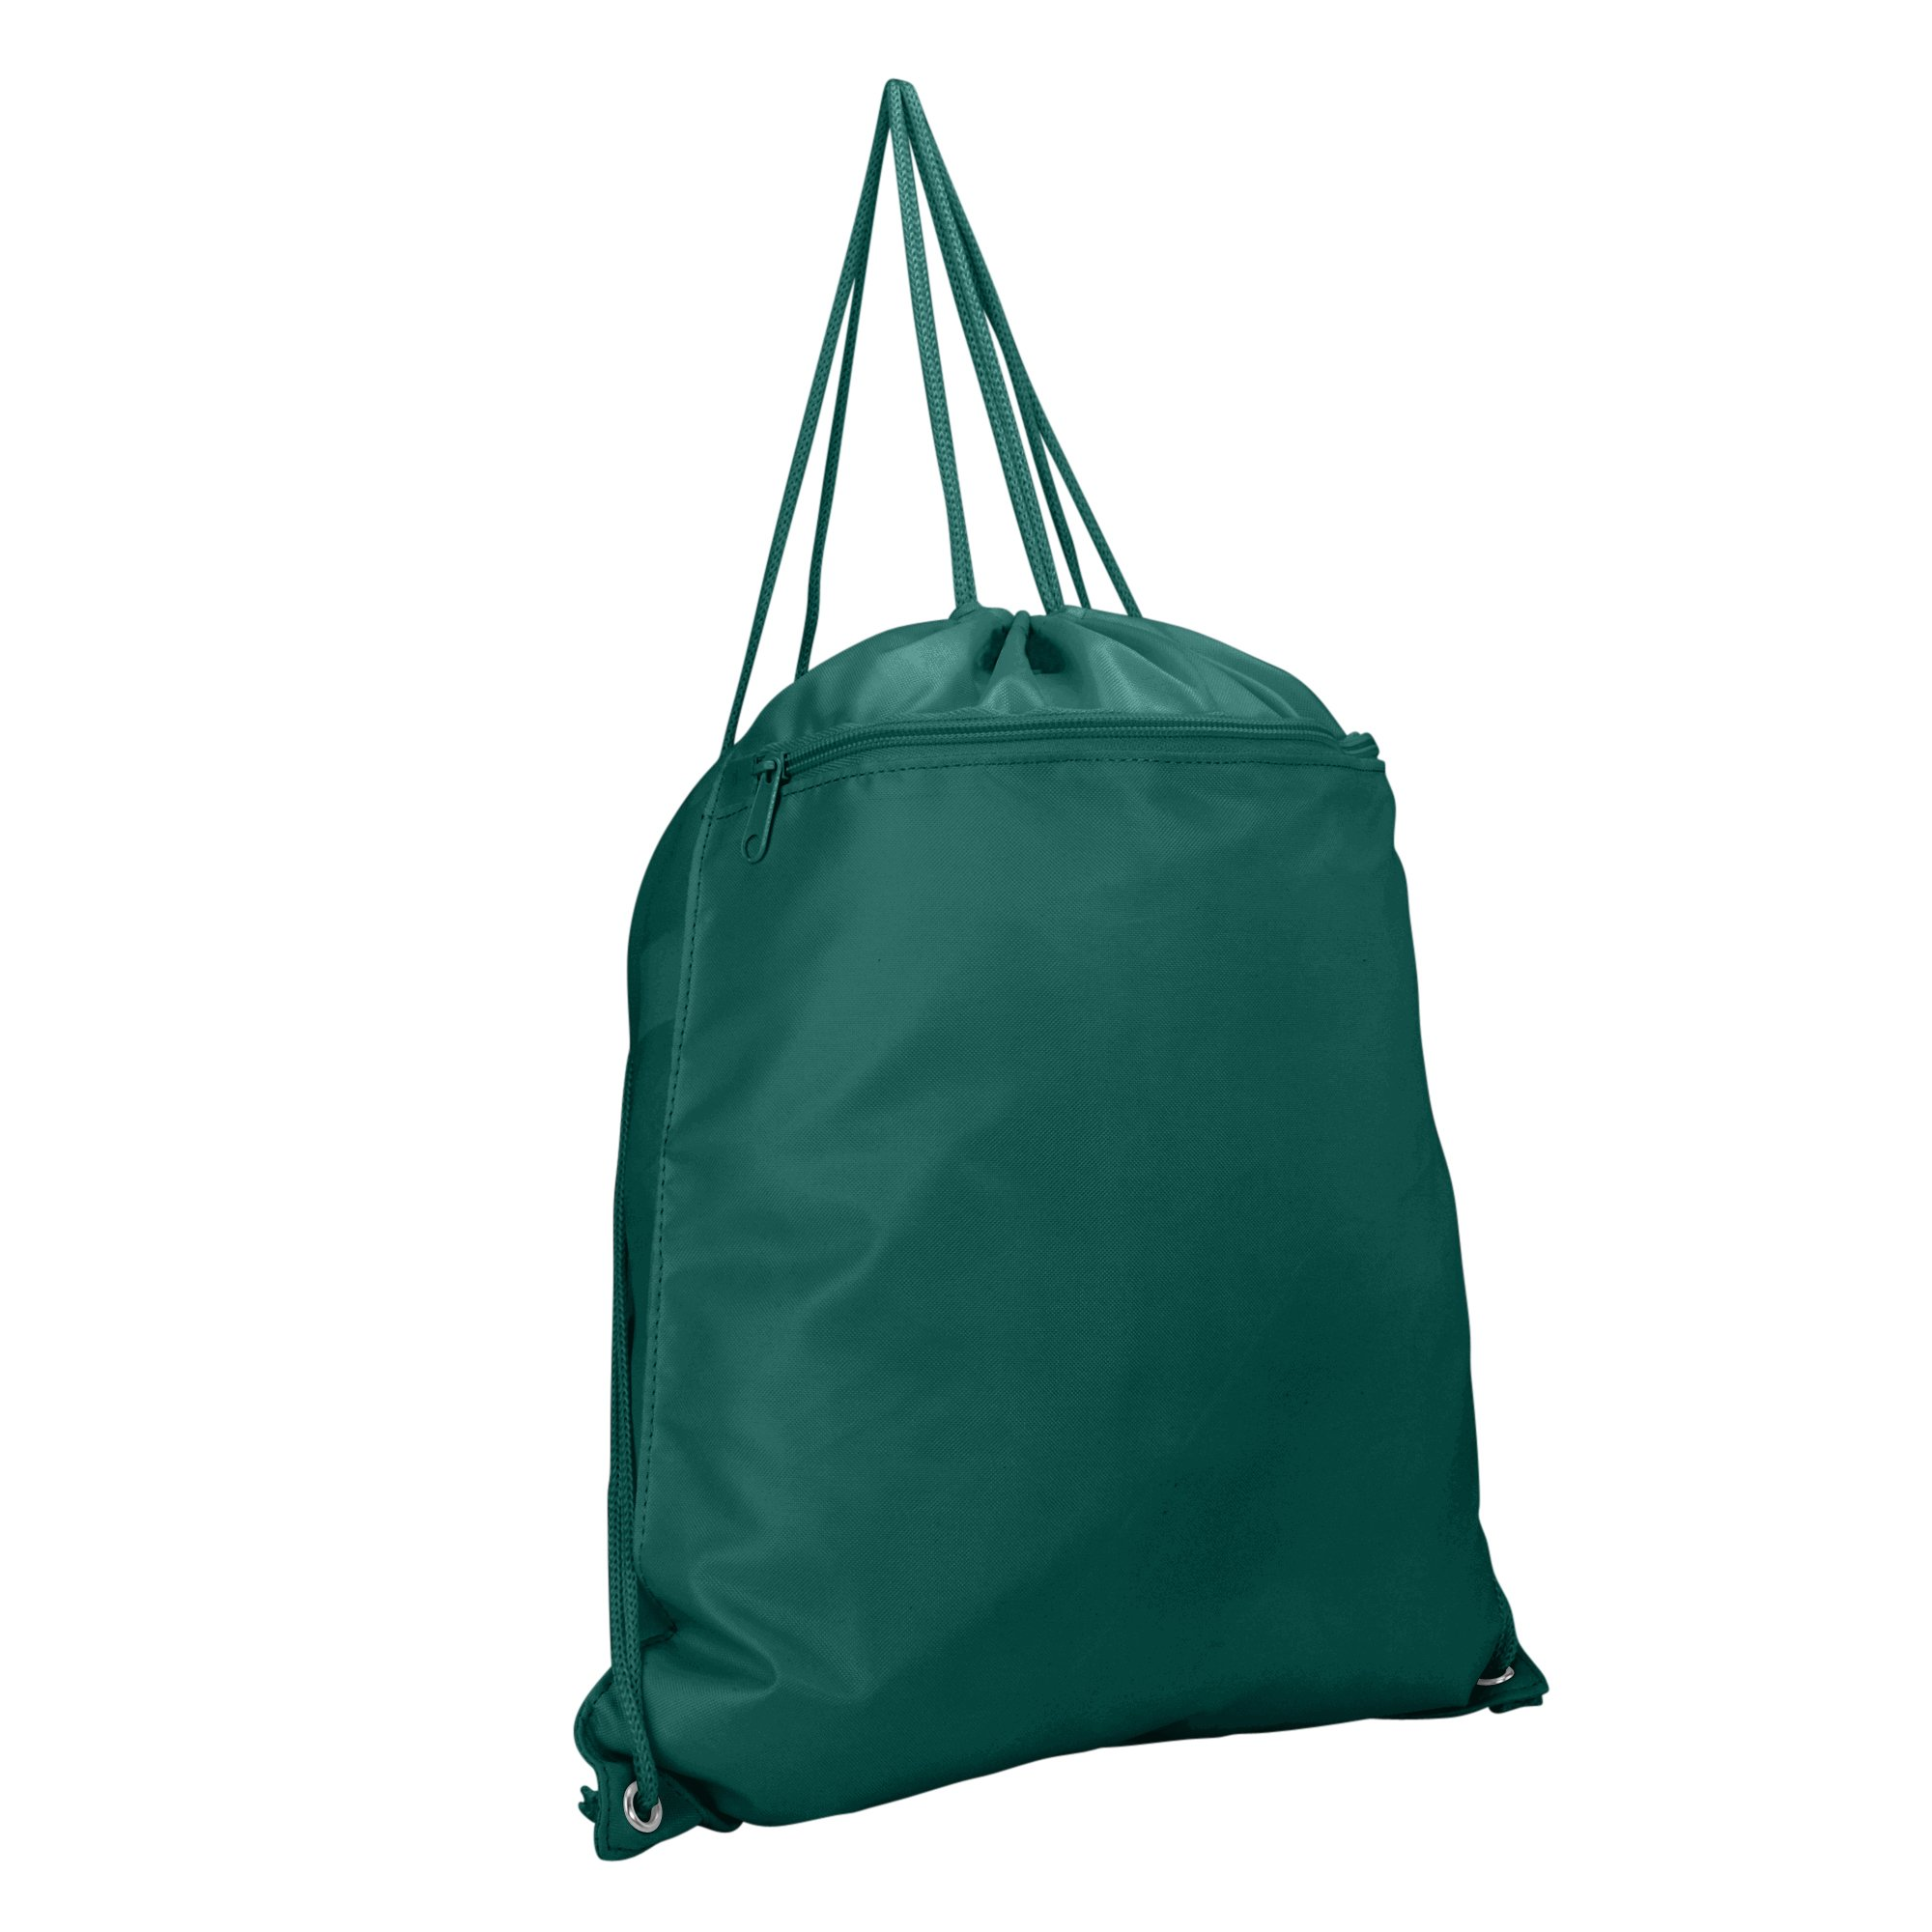 DALIX Sock Pack Drawstring Backpack Bag Sack in Dark Green